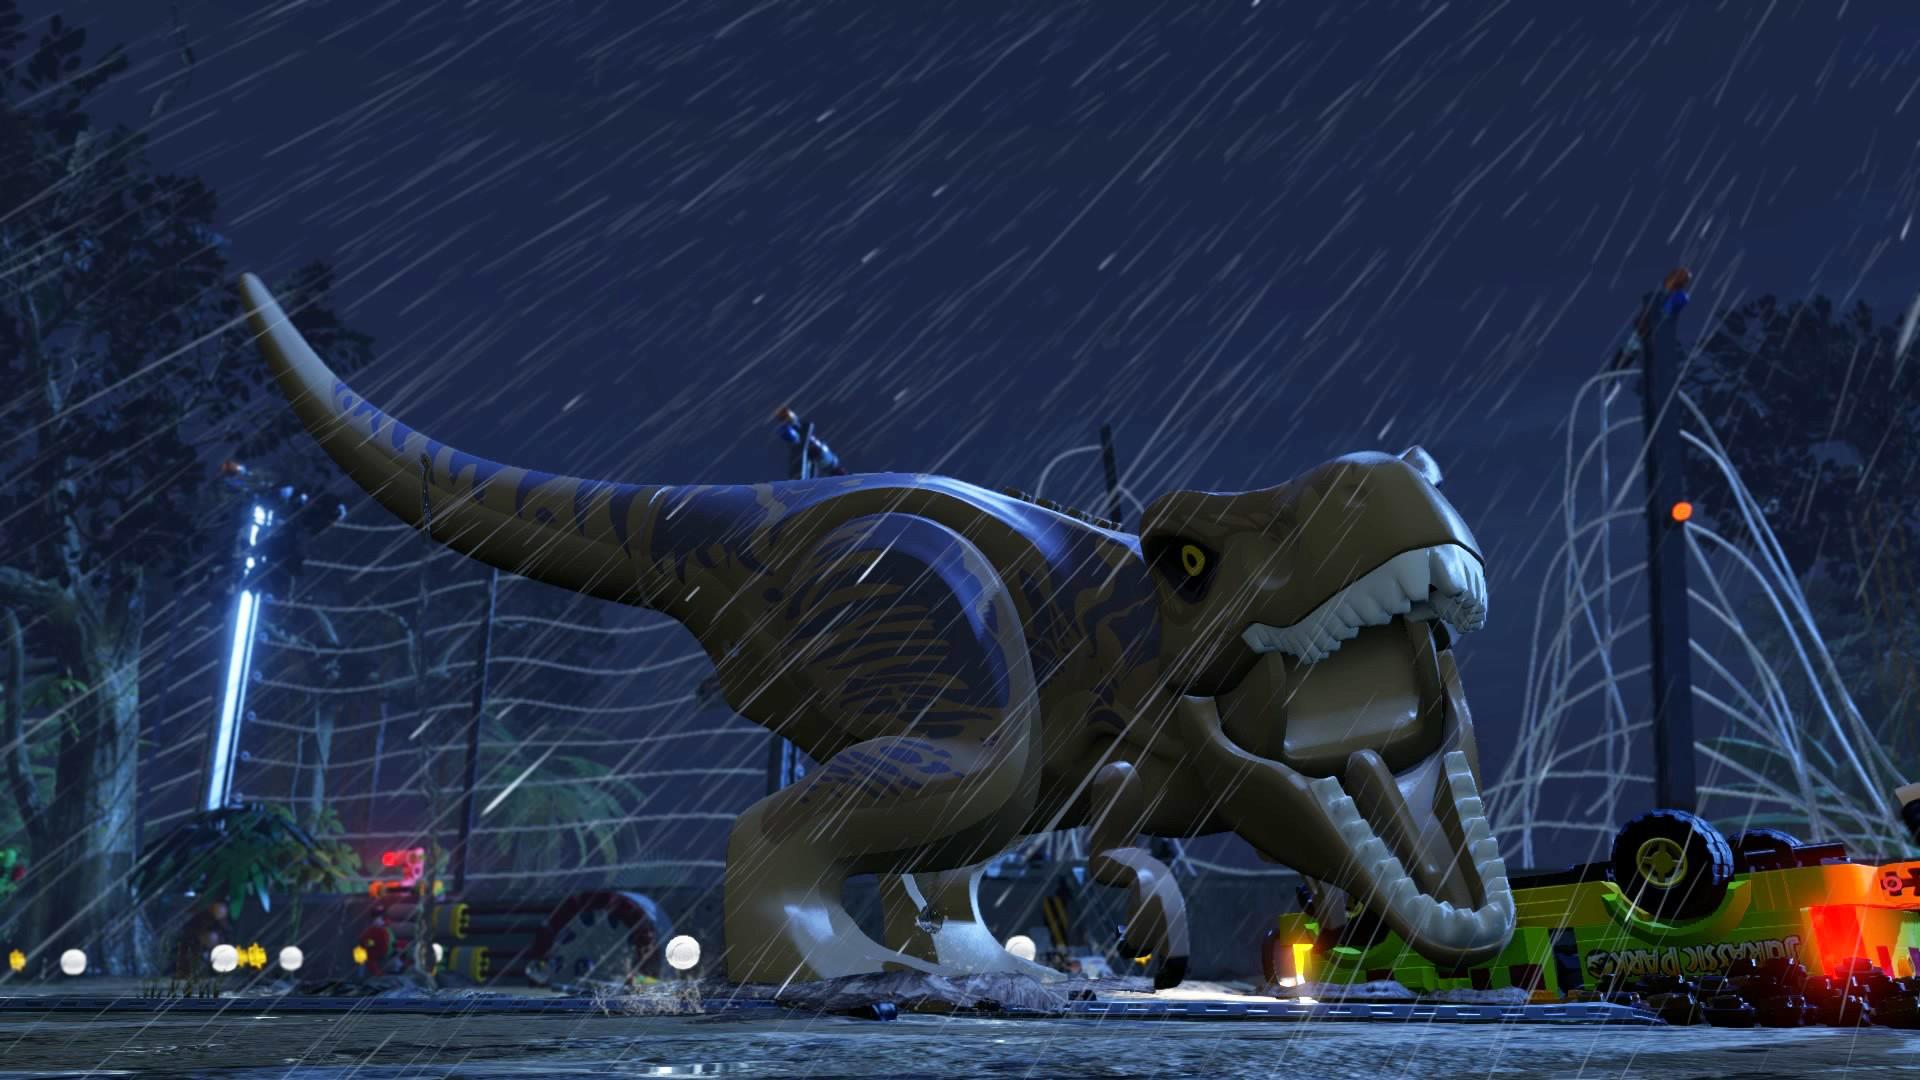 Elicottero Jurassic World : Acheter lego jurassic world steam